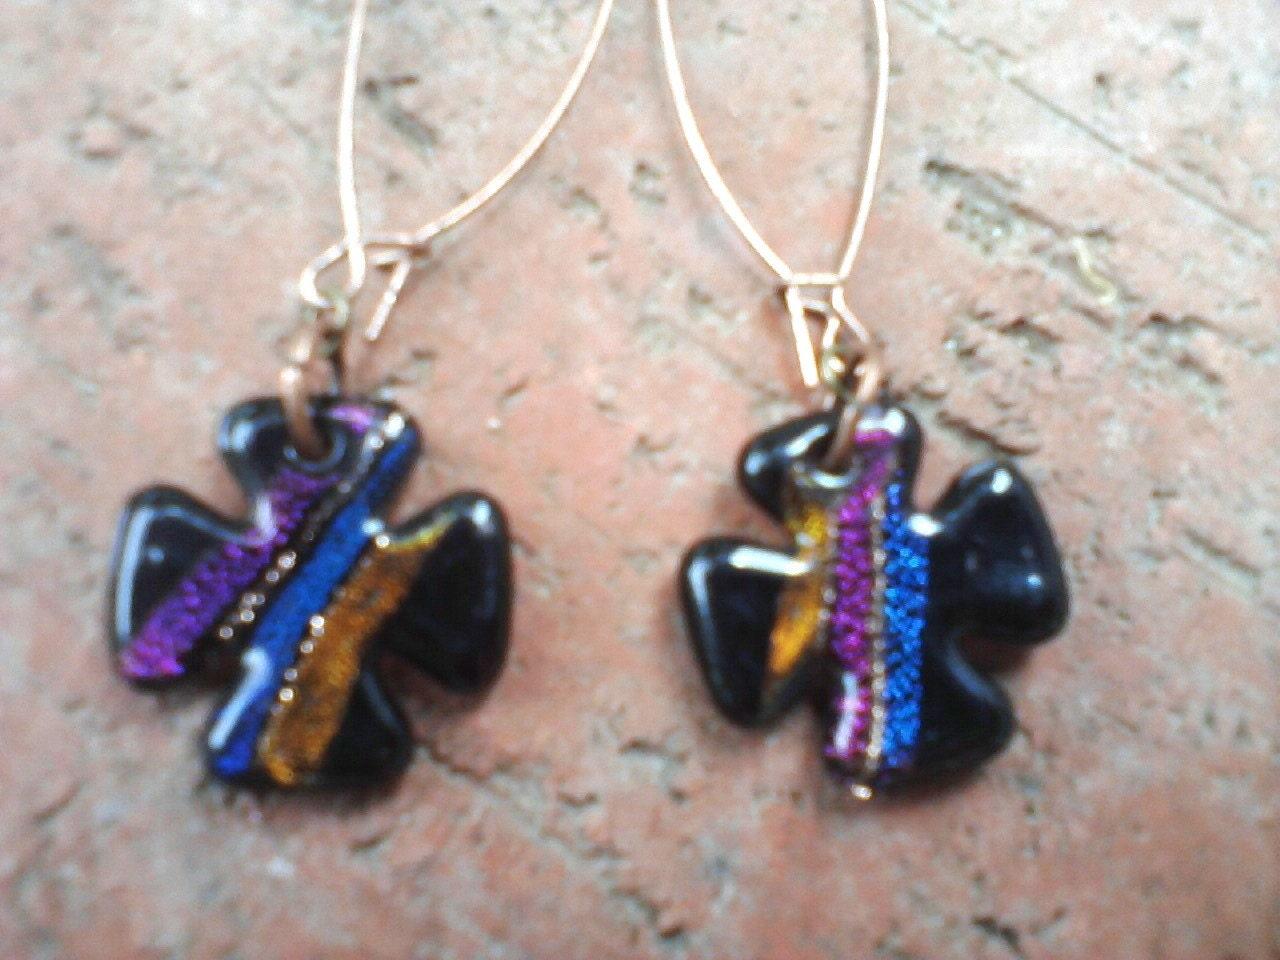 Dichroic, Glistening Black Glass Celtic Cross - Long Luscious Copper Kidney Wired Earrings, OOAK Glass Celtic Cross Earrings